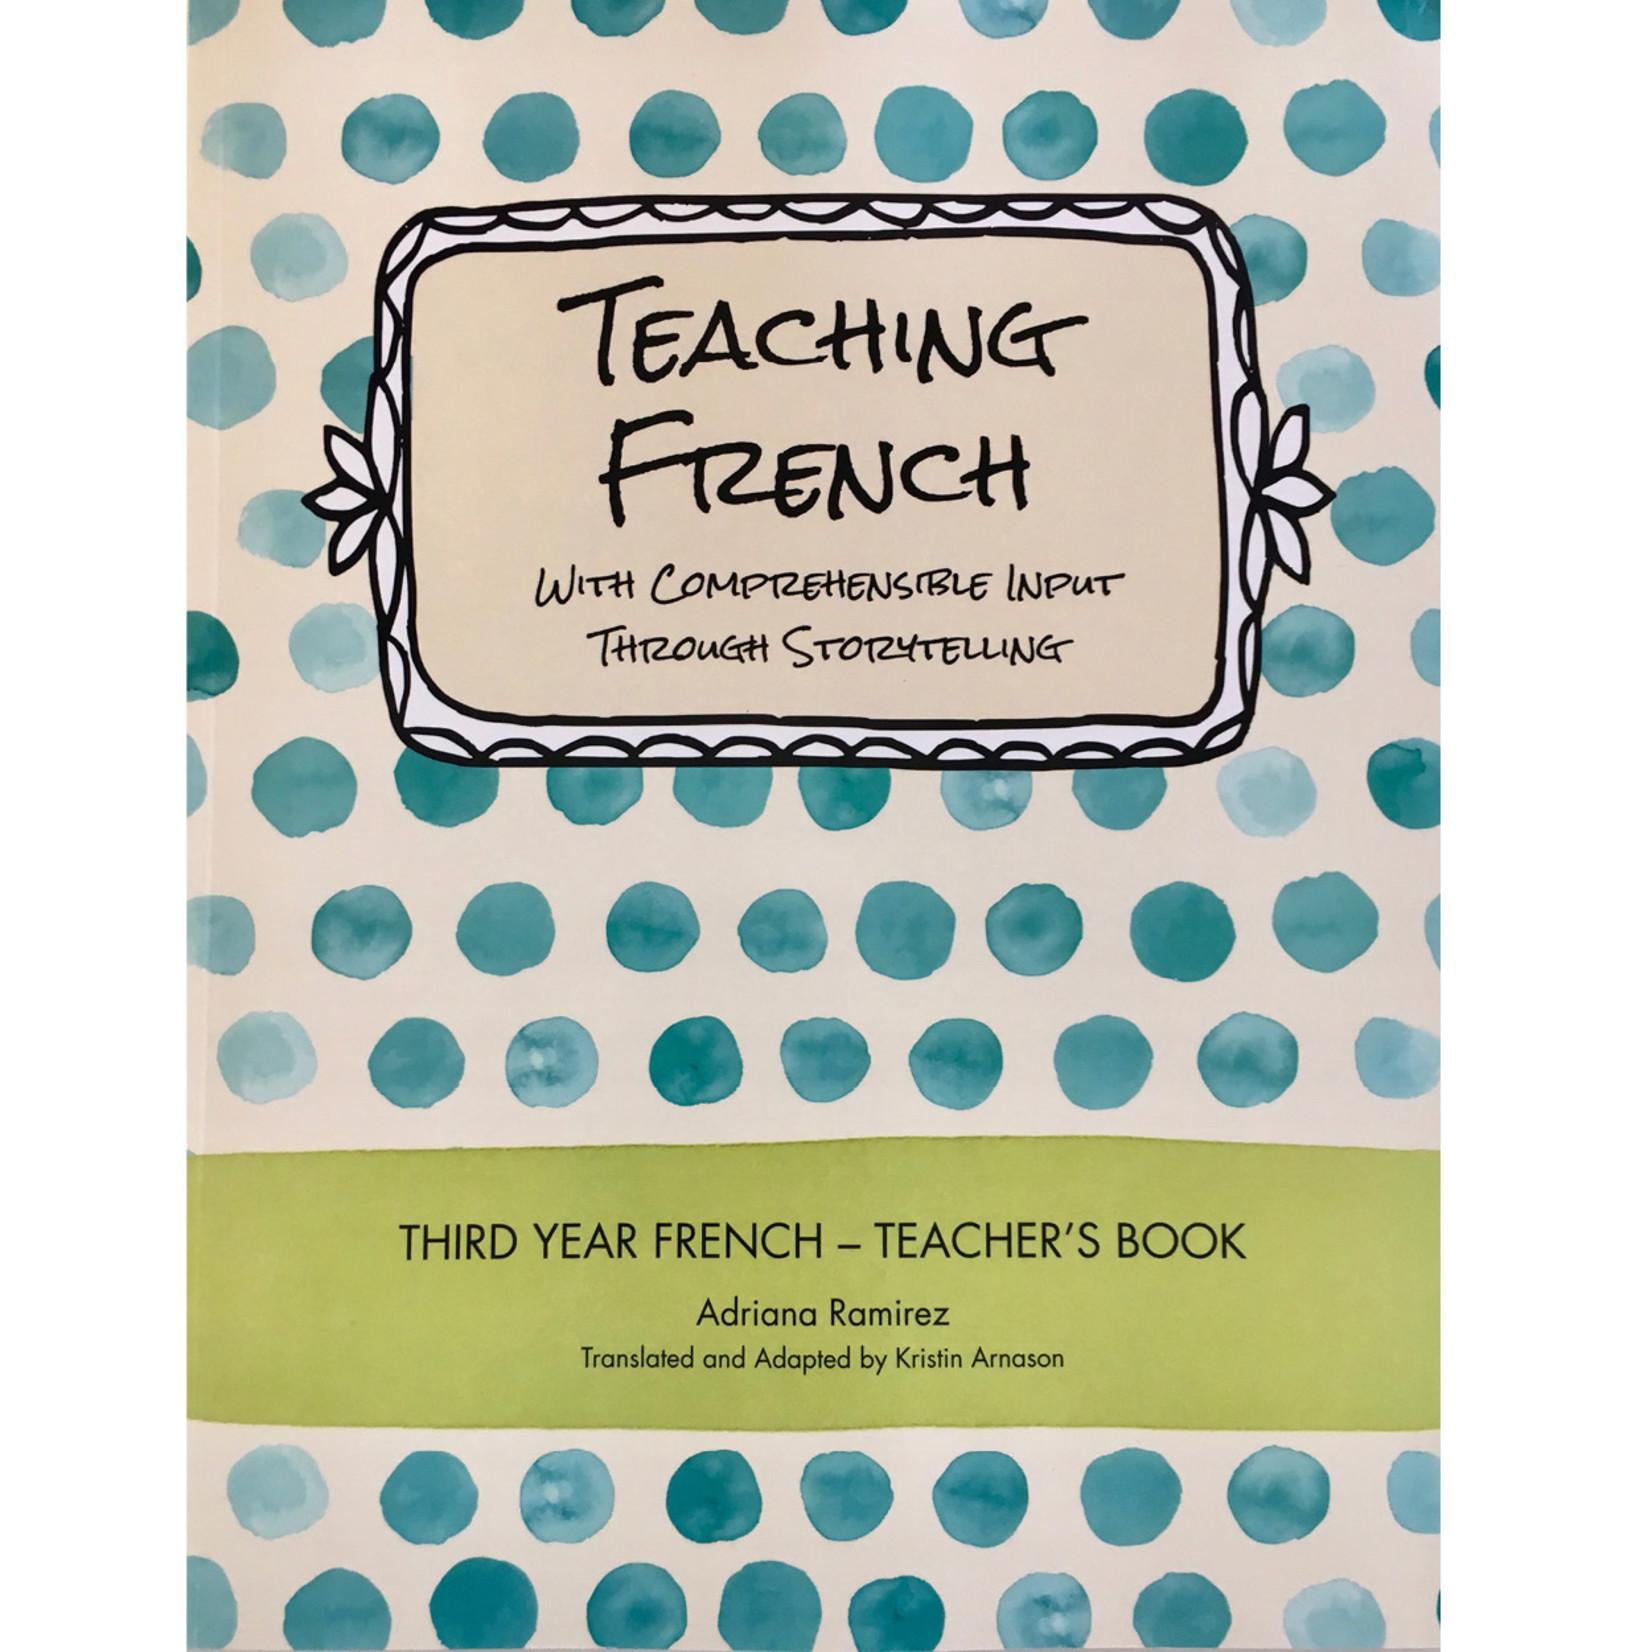 Adriana Ramirez Teaching French with comprehensible input through storytelling - 3